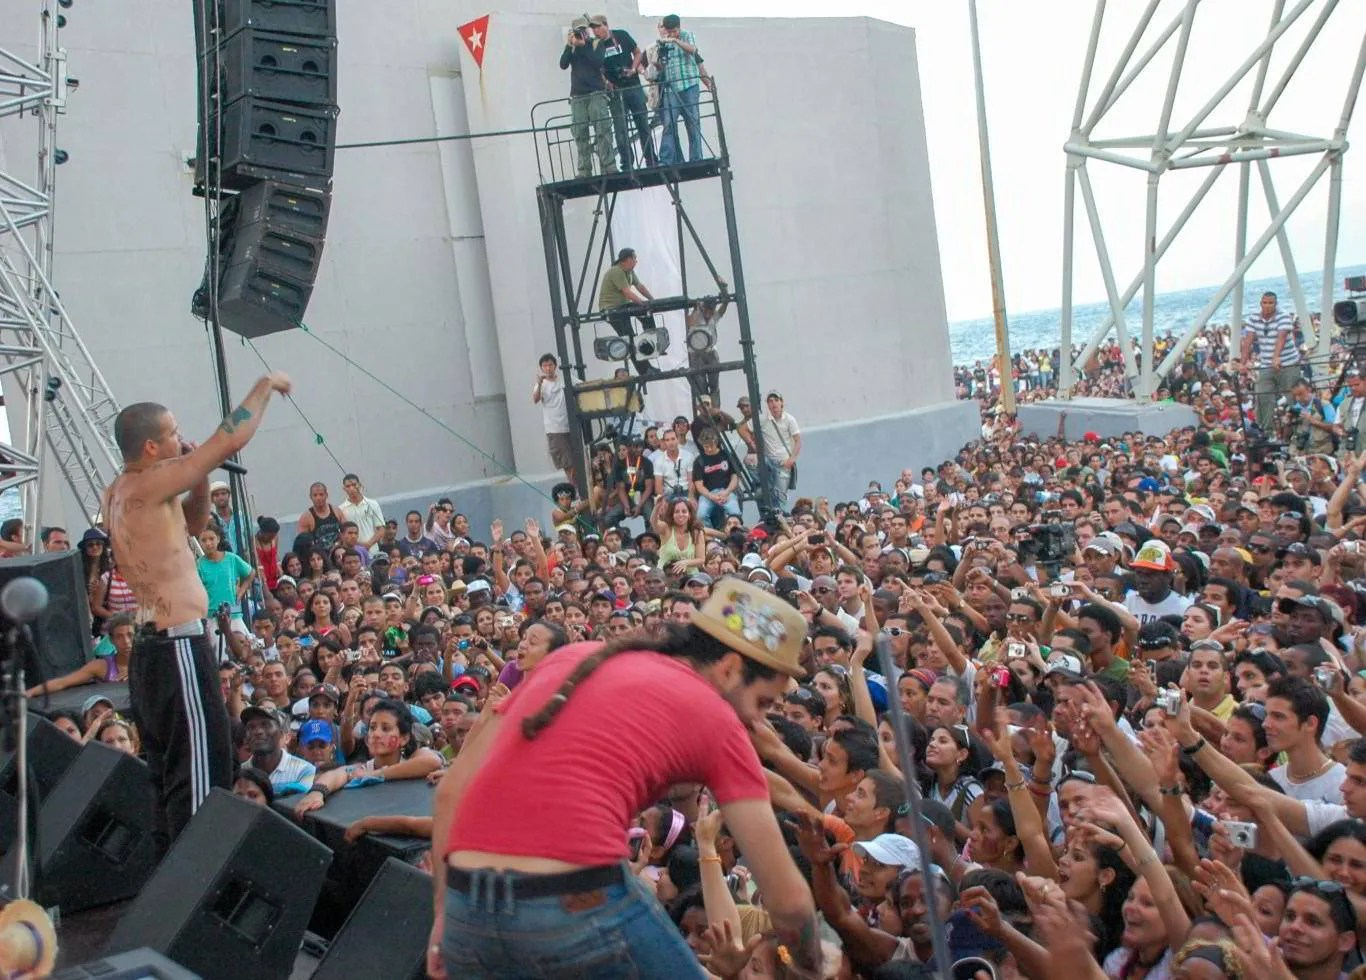 Concert of Calle 13 in the José Martí Anti-Imperialist Tribune, on March 23, 2010. Photo: Kaloian.